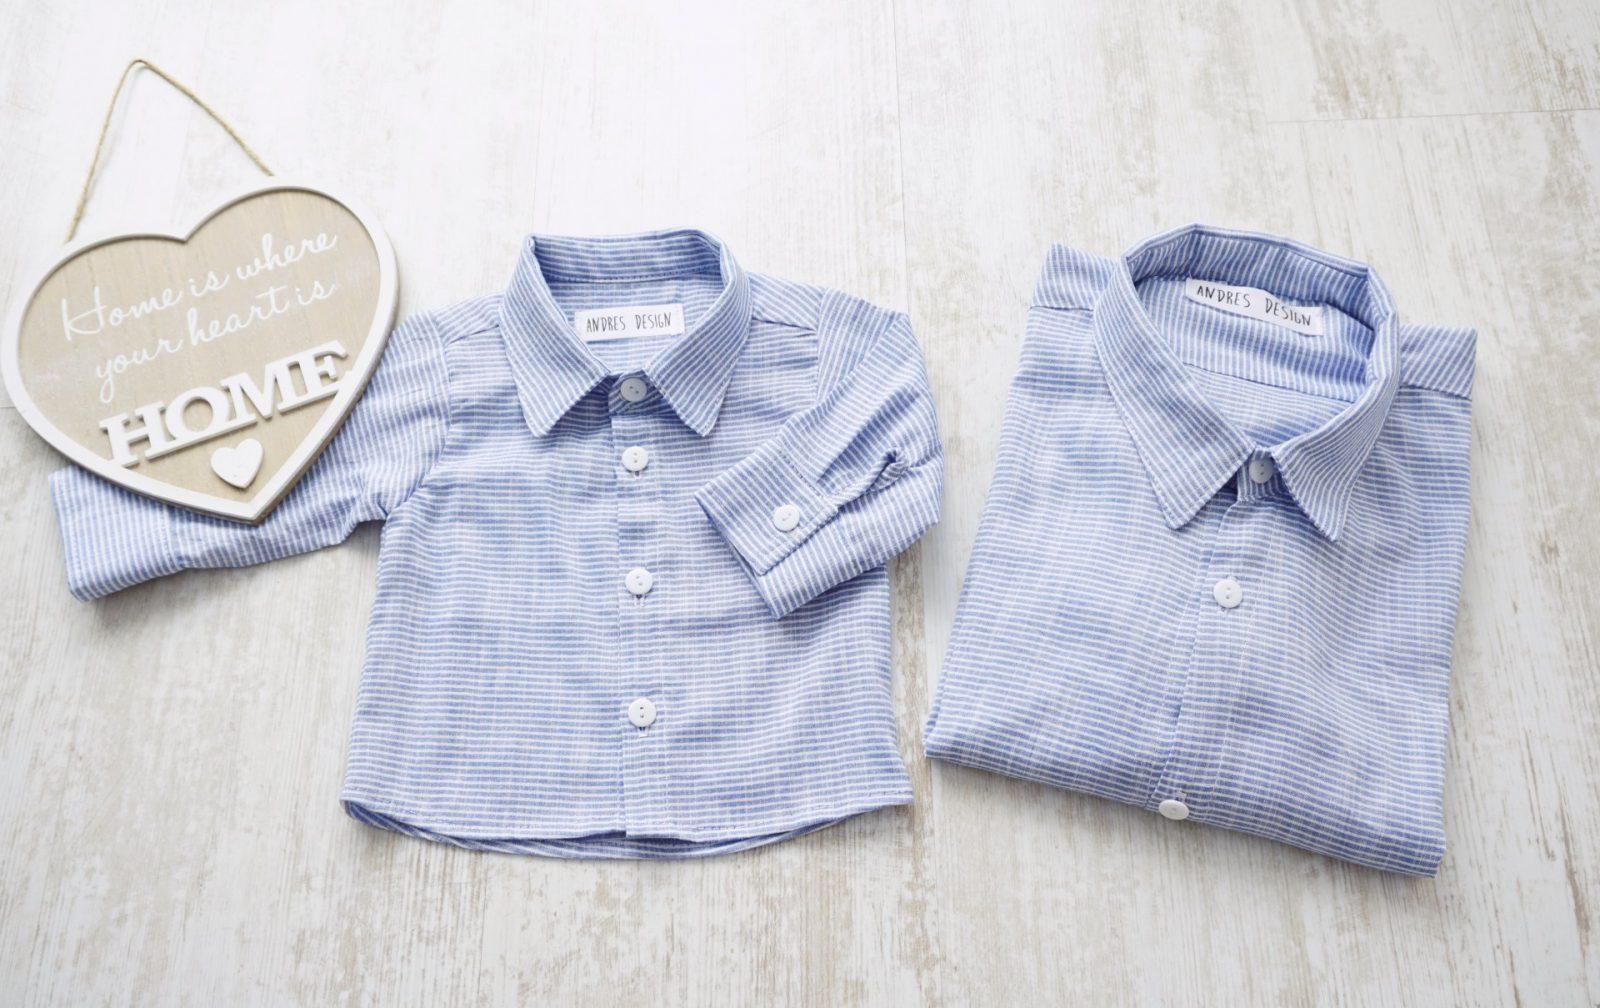 Camasi Tata Fiu – in dungi alb bleu